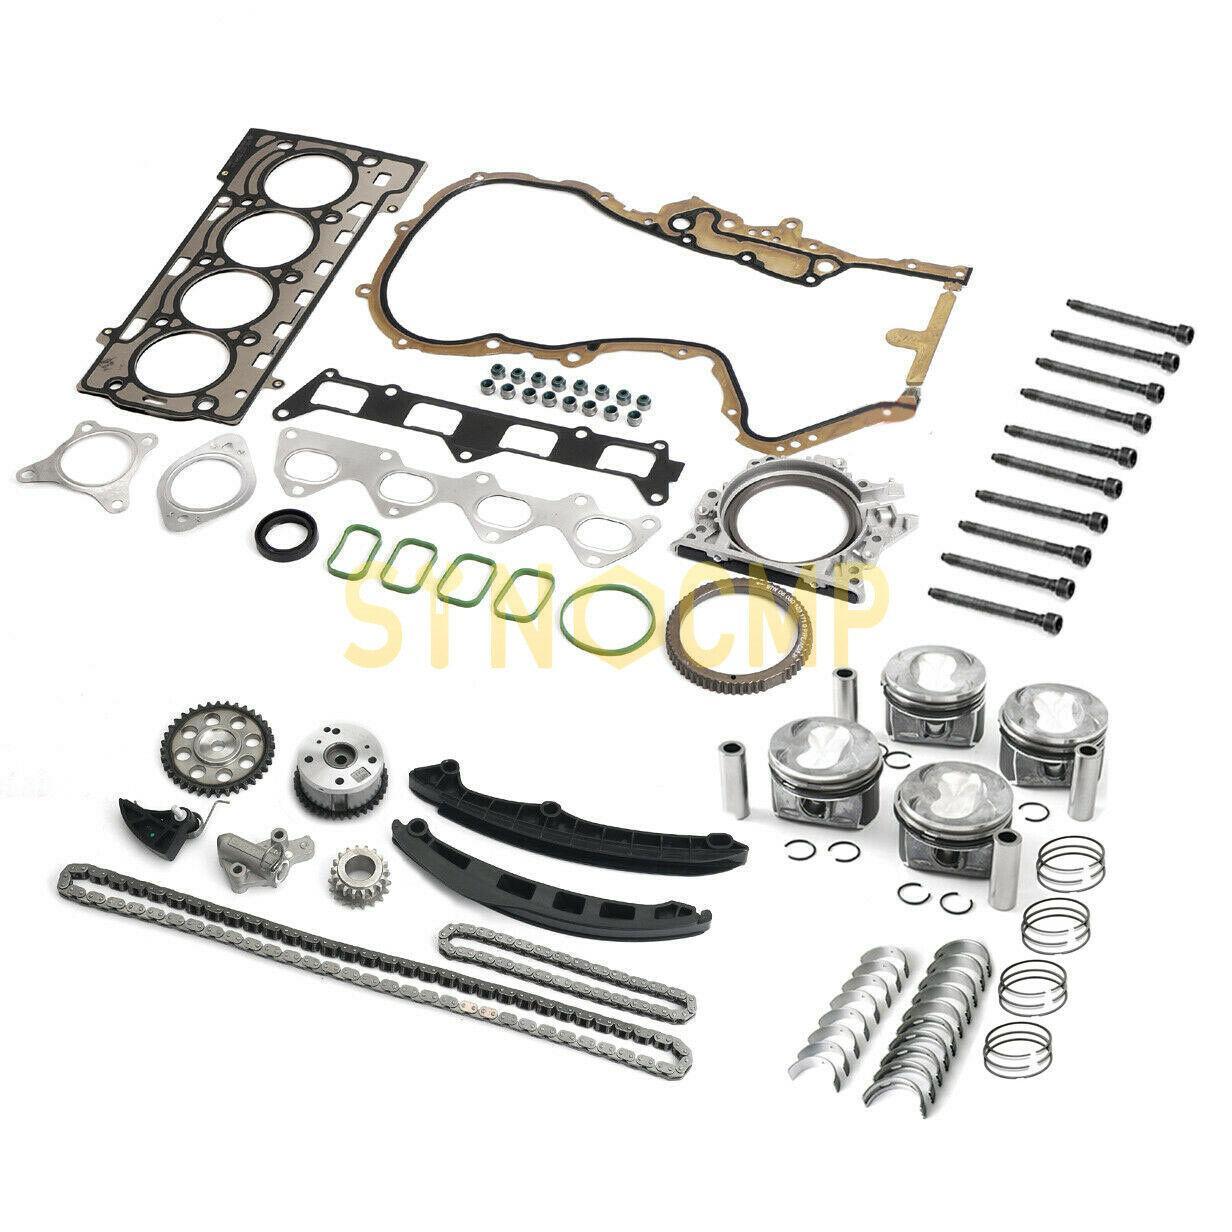 طقم إصلاح وتجديد المحرك لـ VW Golf ، Audi 1.4 TSI Tiguan Jetta CAVD CTHD CNWA CTKA e11mm EA111